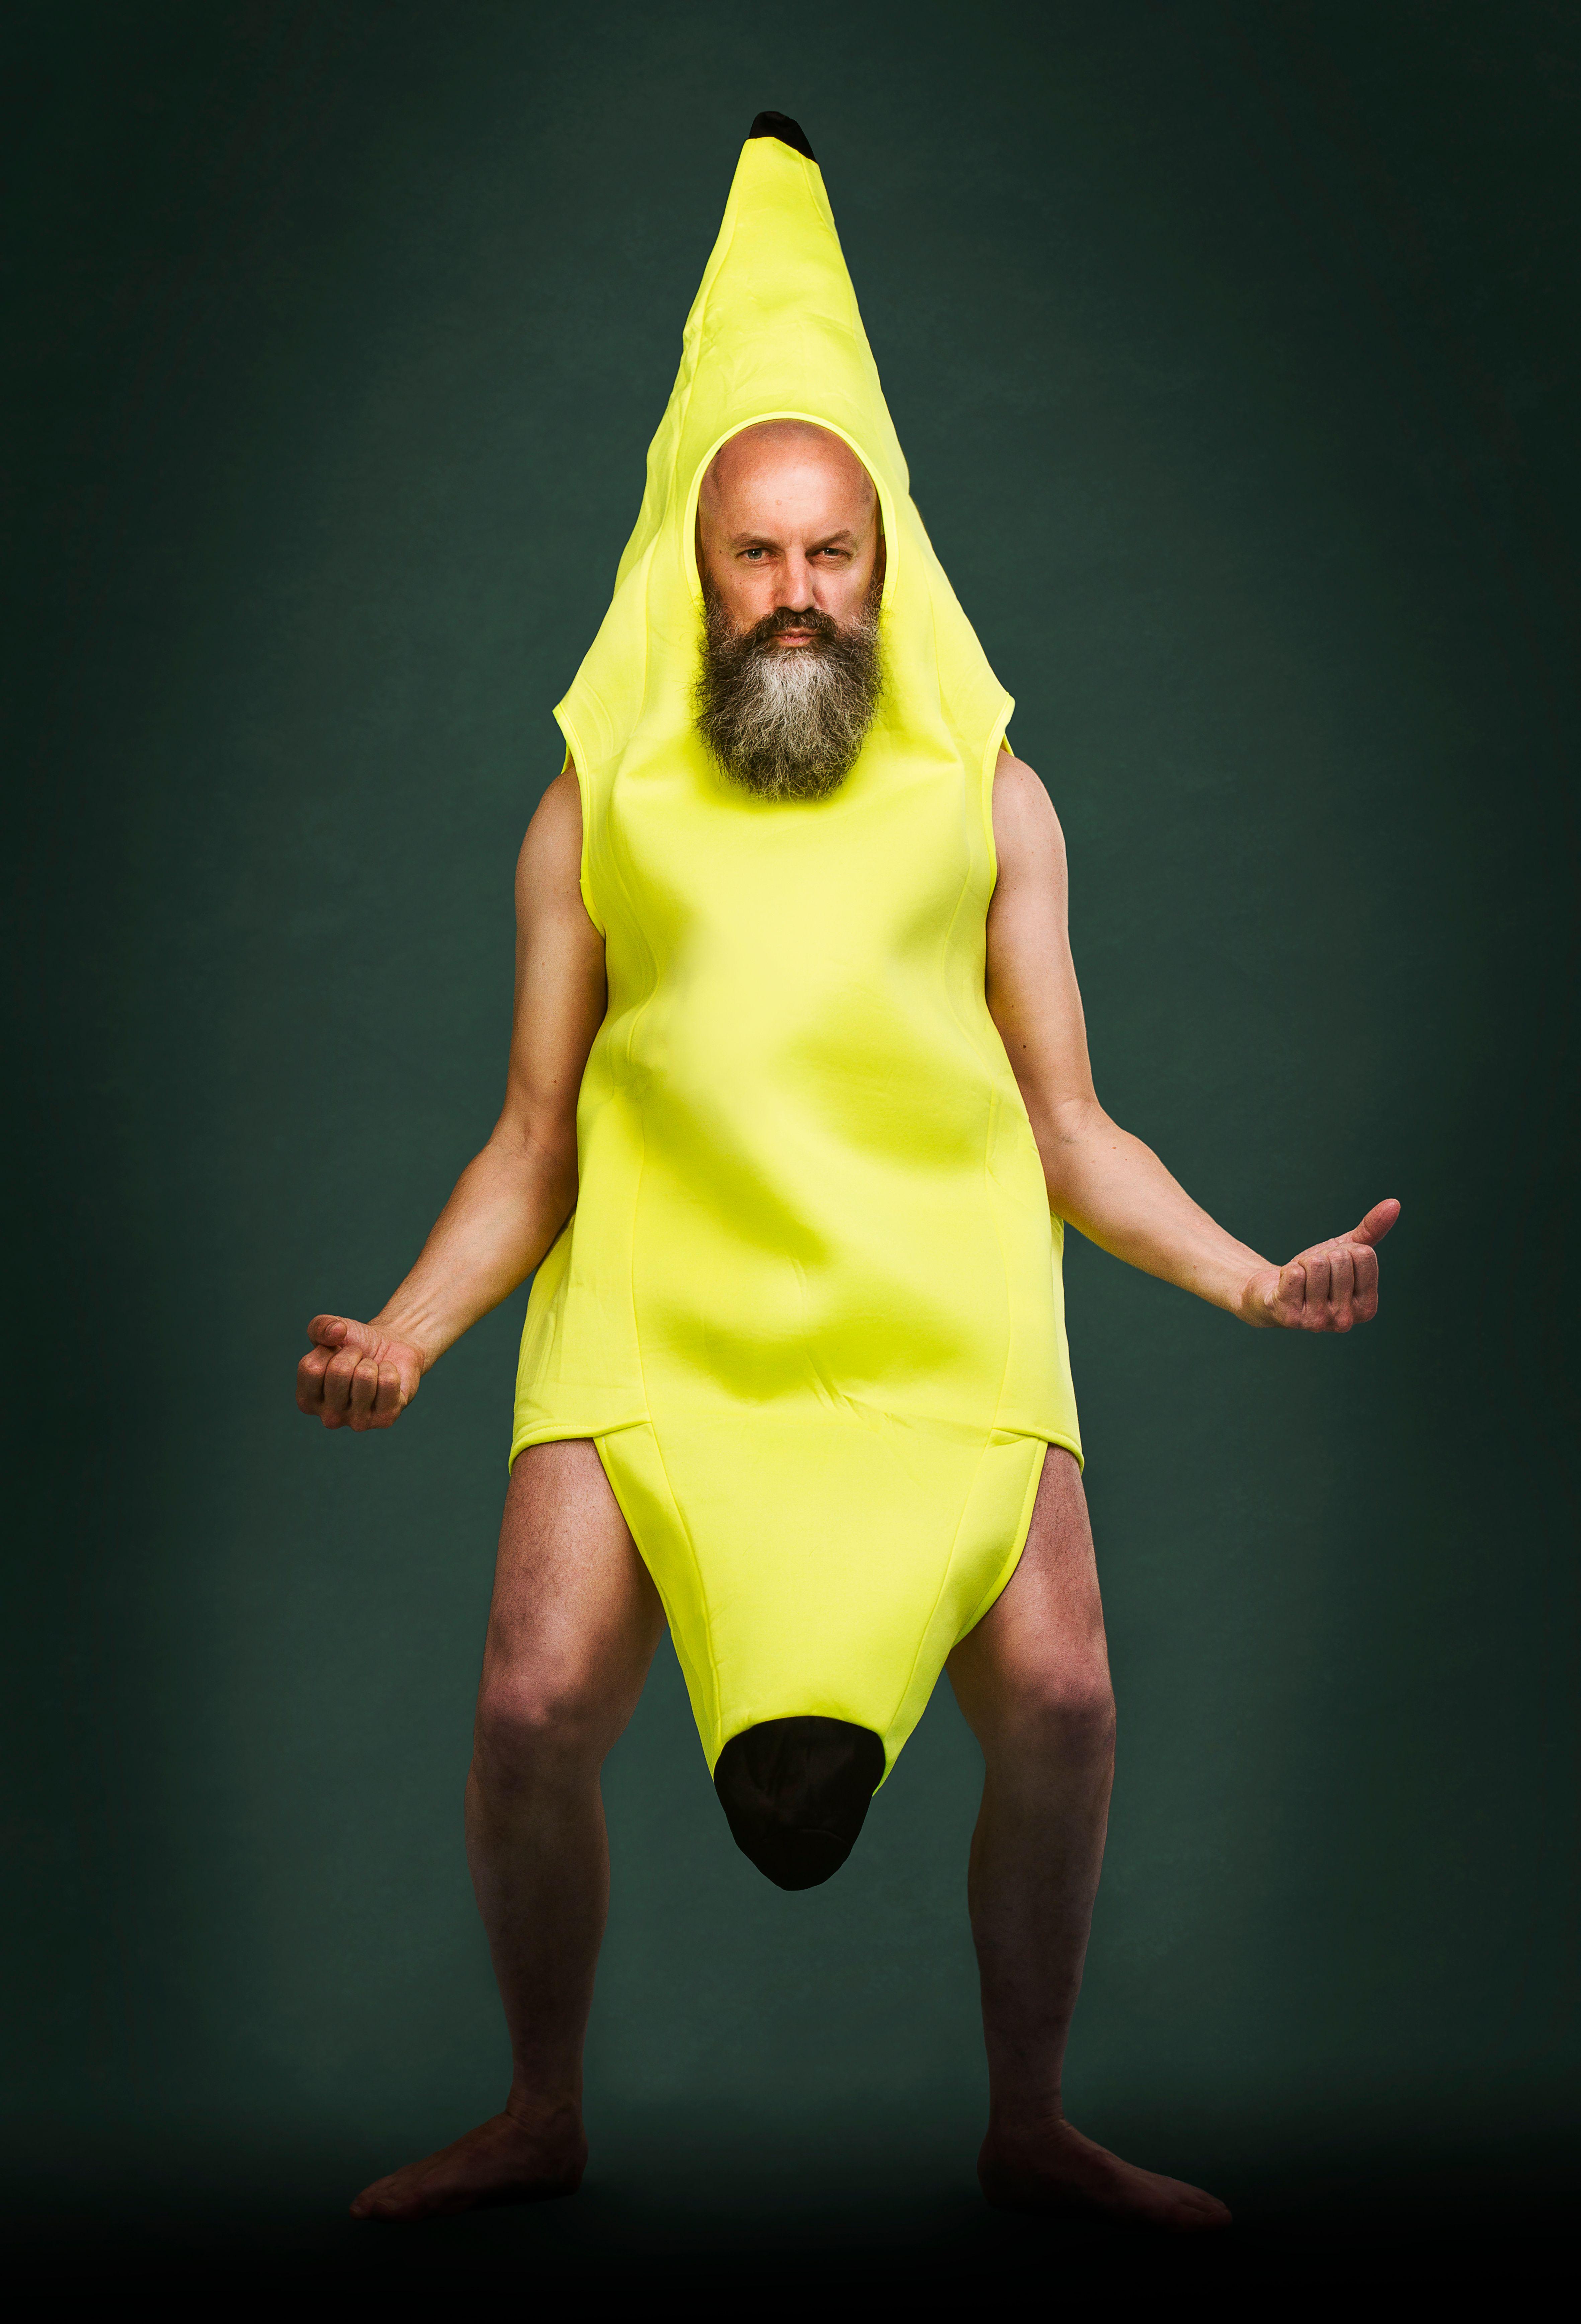 Bare Egil i banankostyme